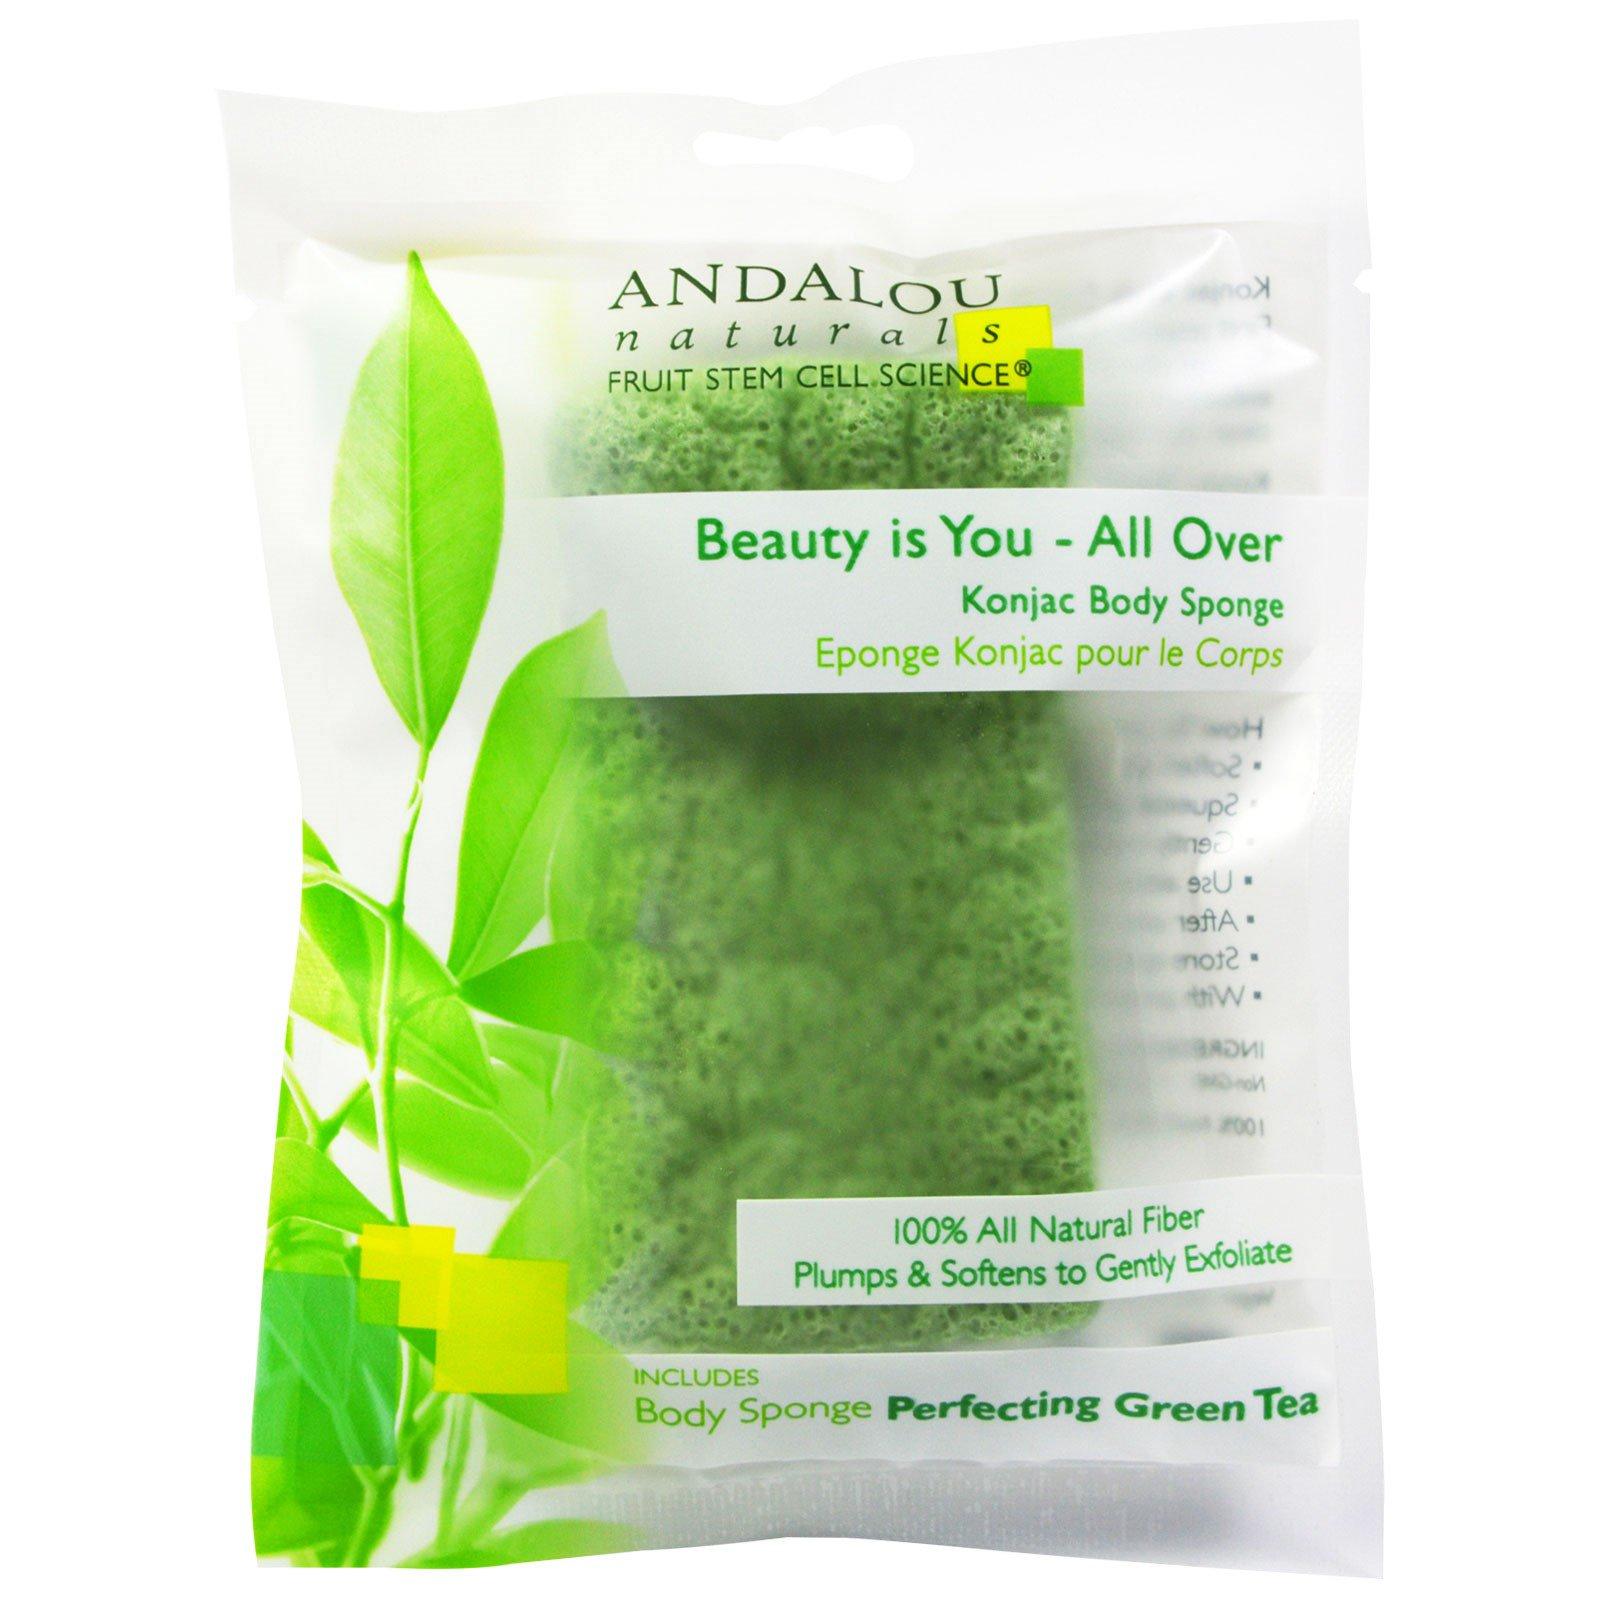 Andalou Naturals, All-Over Konjac Body Sponge, 1 ct